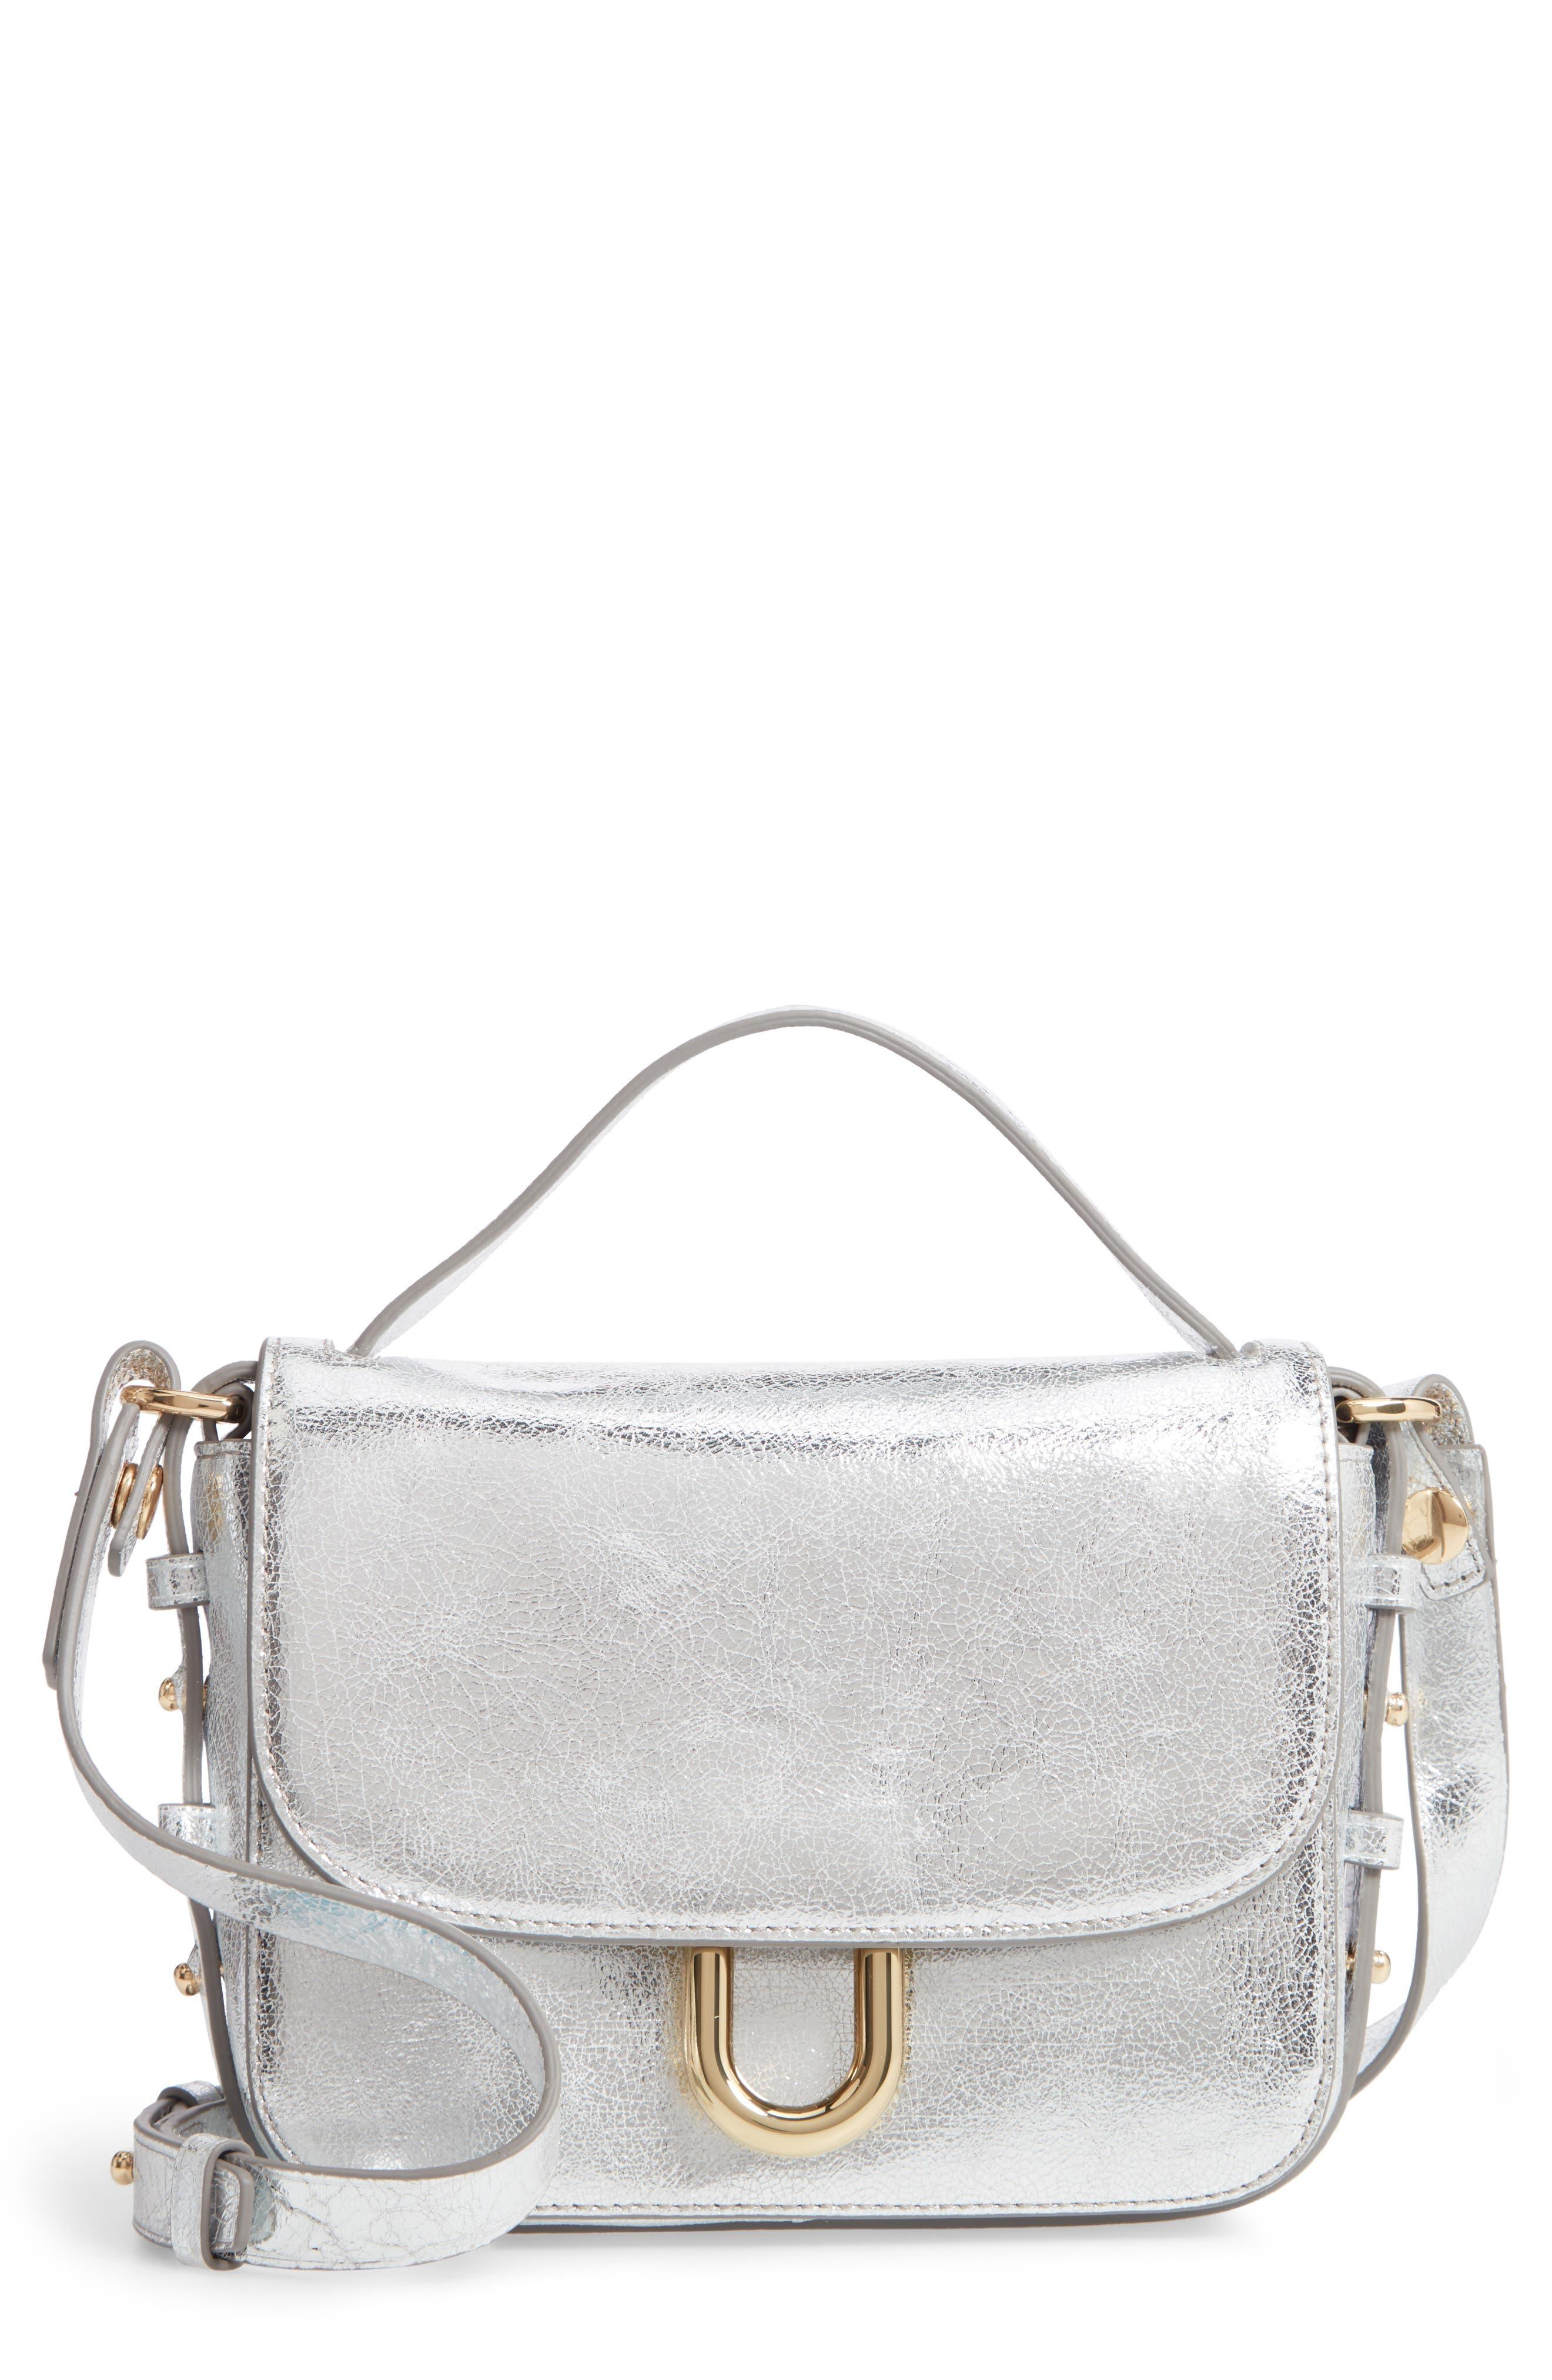 Harper Metallic Leather Crossbody Bag,                             Main thumbnail 1, color,                             METALLIC SILVER